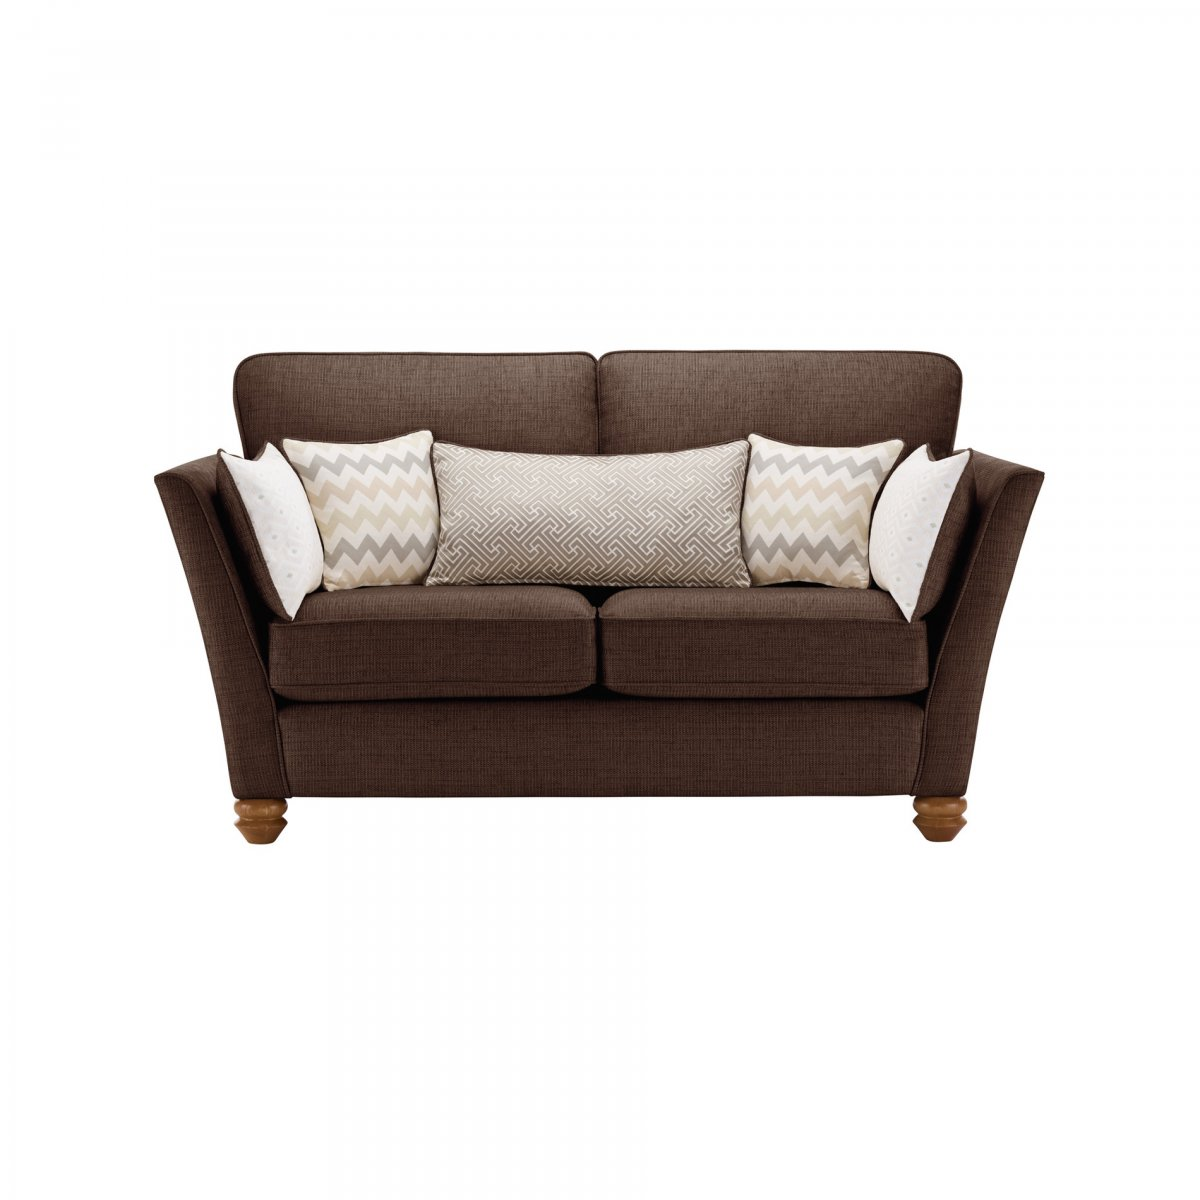 Oak furniture land sofas for Furniture land